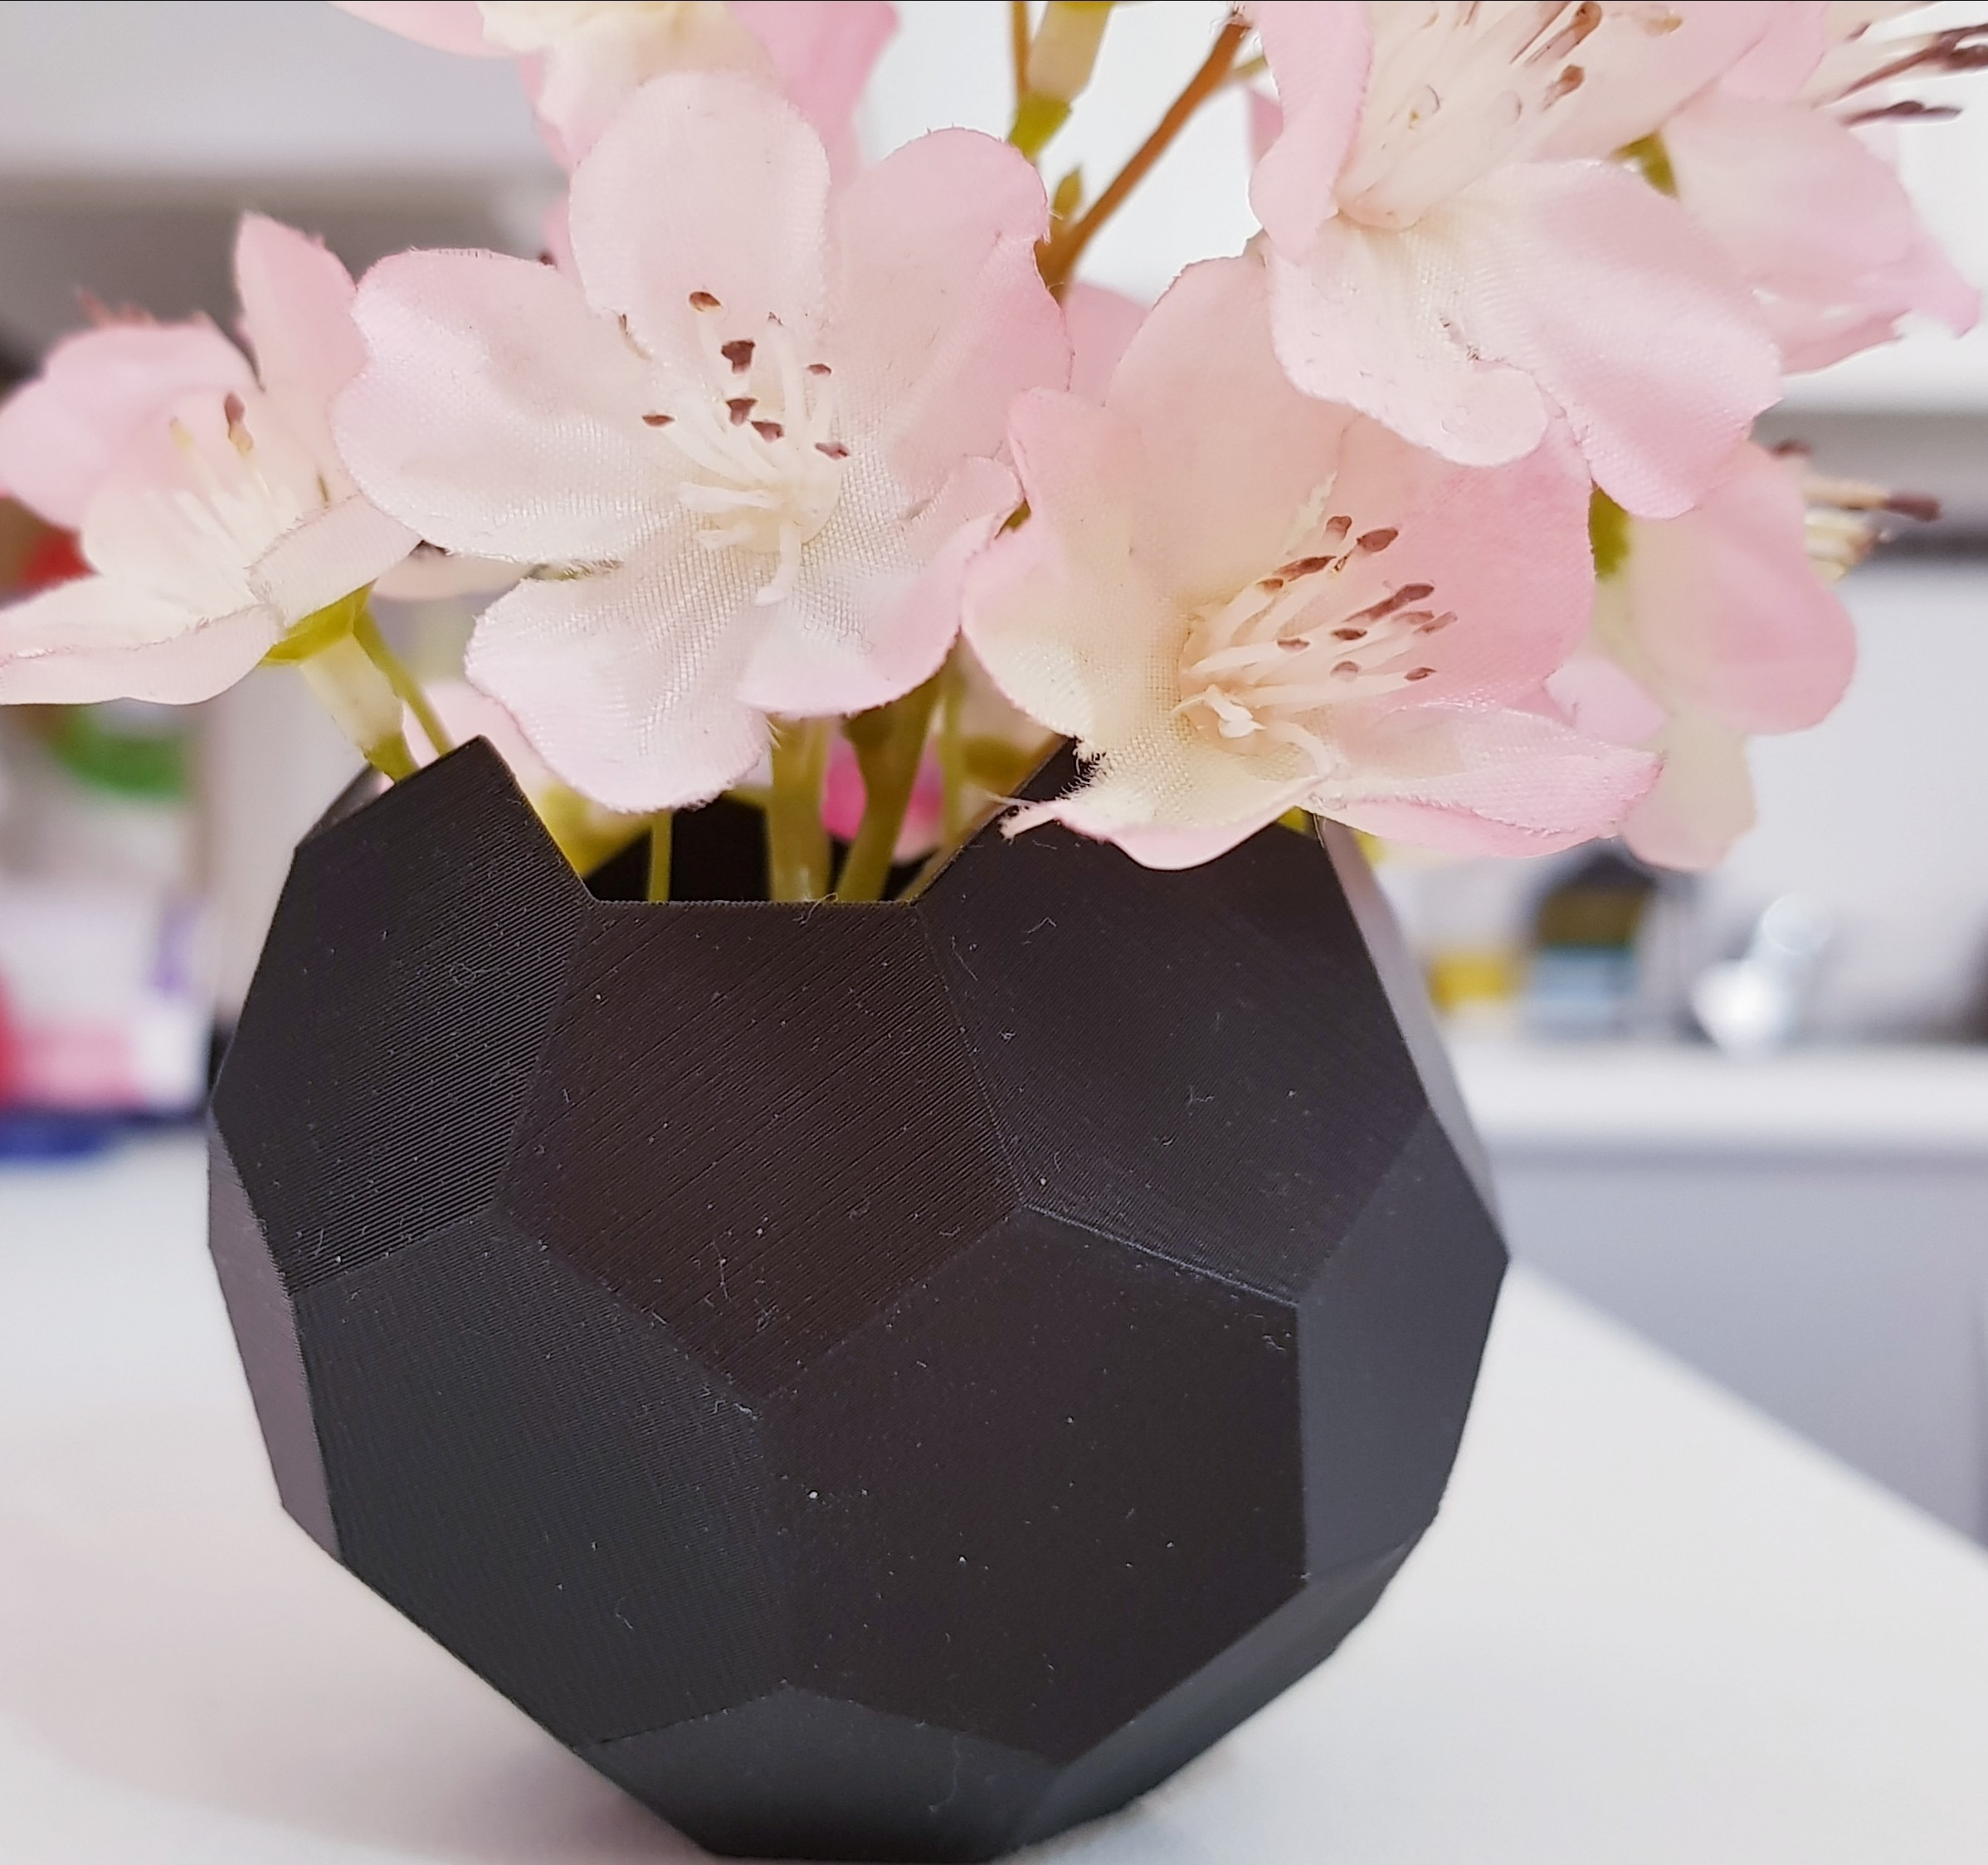 20180219_111625.jpg Download free STL file Mini planter • 3D printing design, solunkejagruti